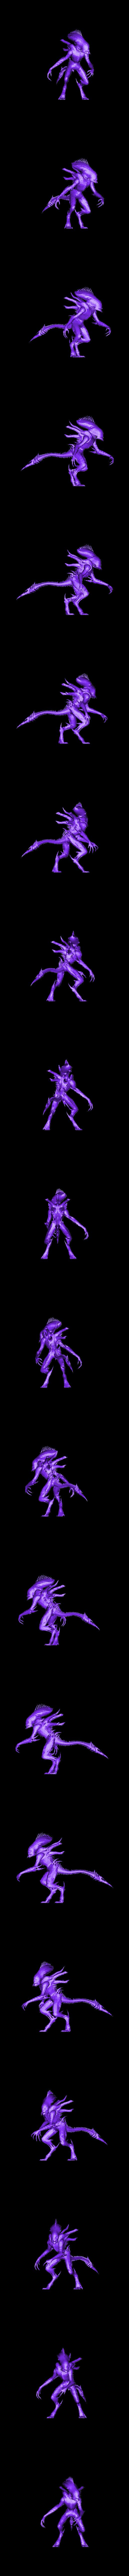 Giant Alien Creature.stl Download free STL file Giant Alien Creature • Object to 3D print, detaildesigner